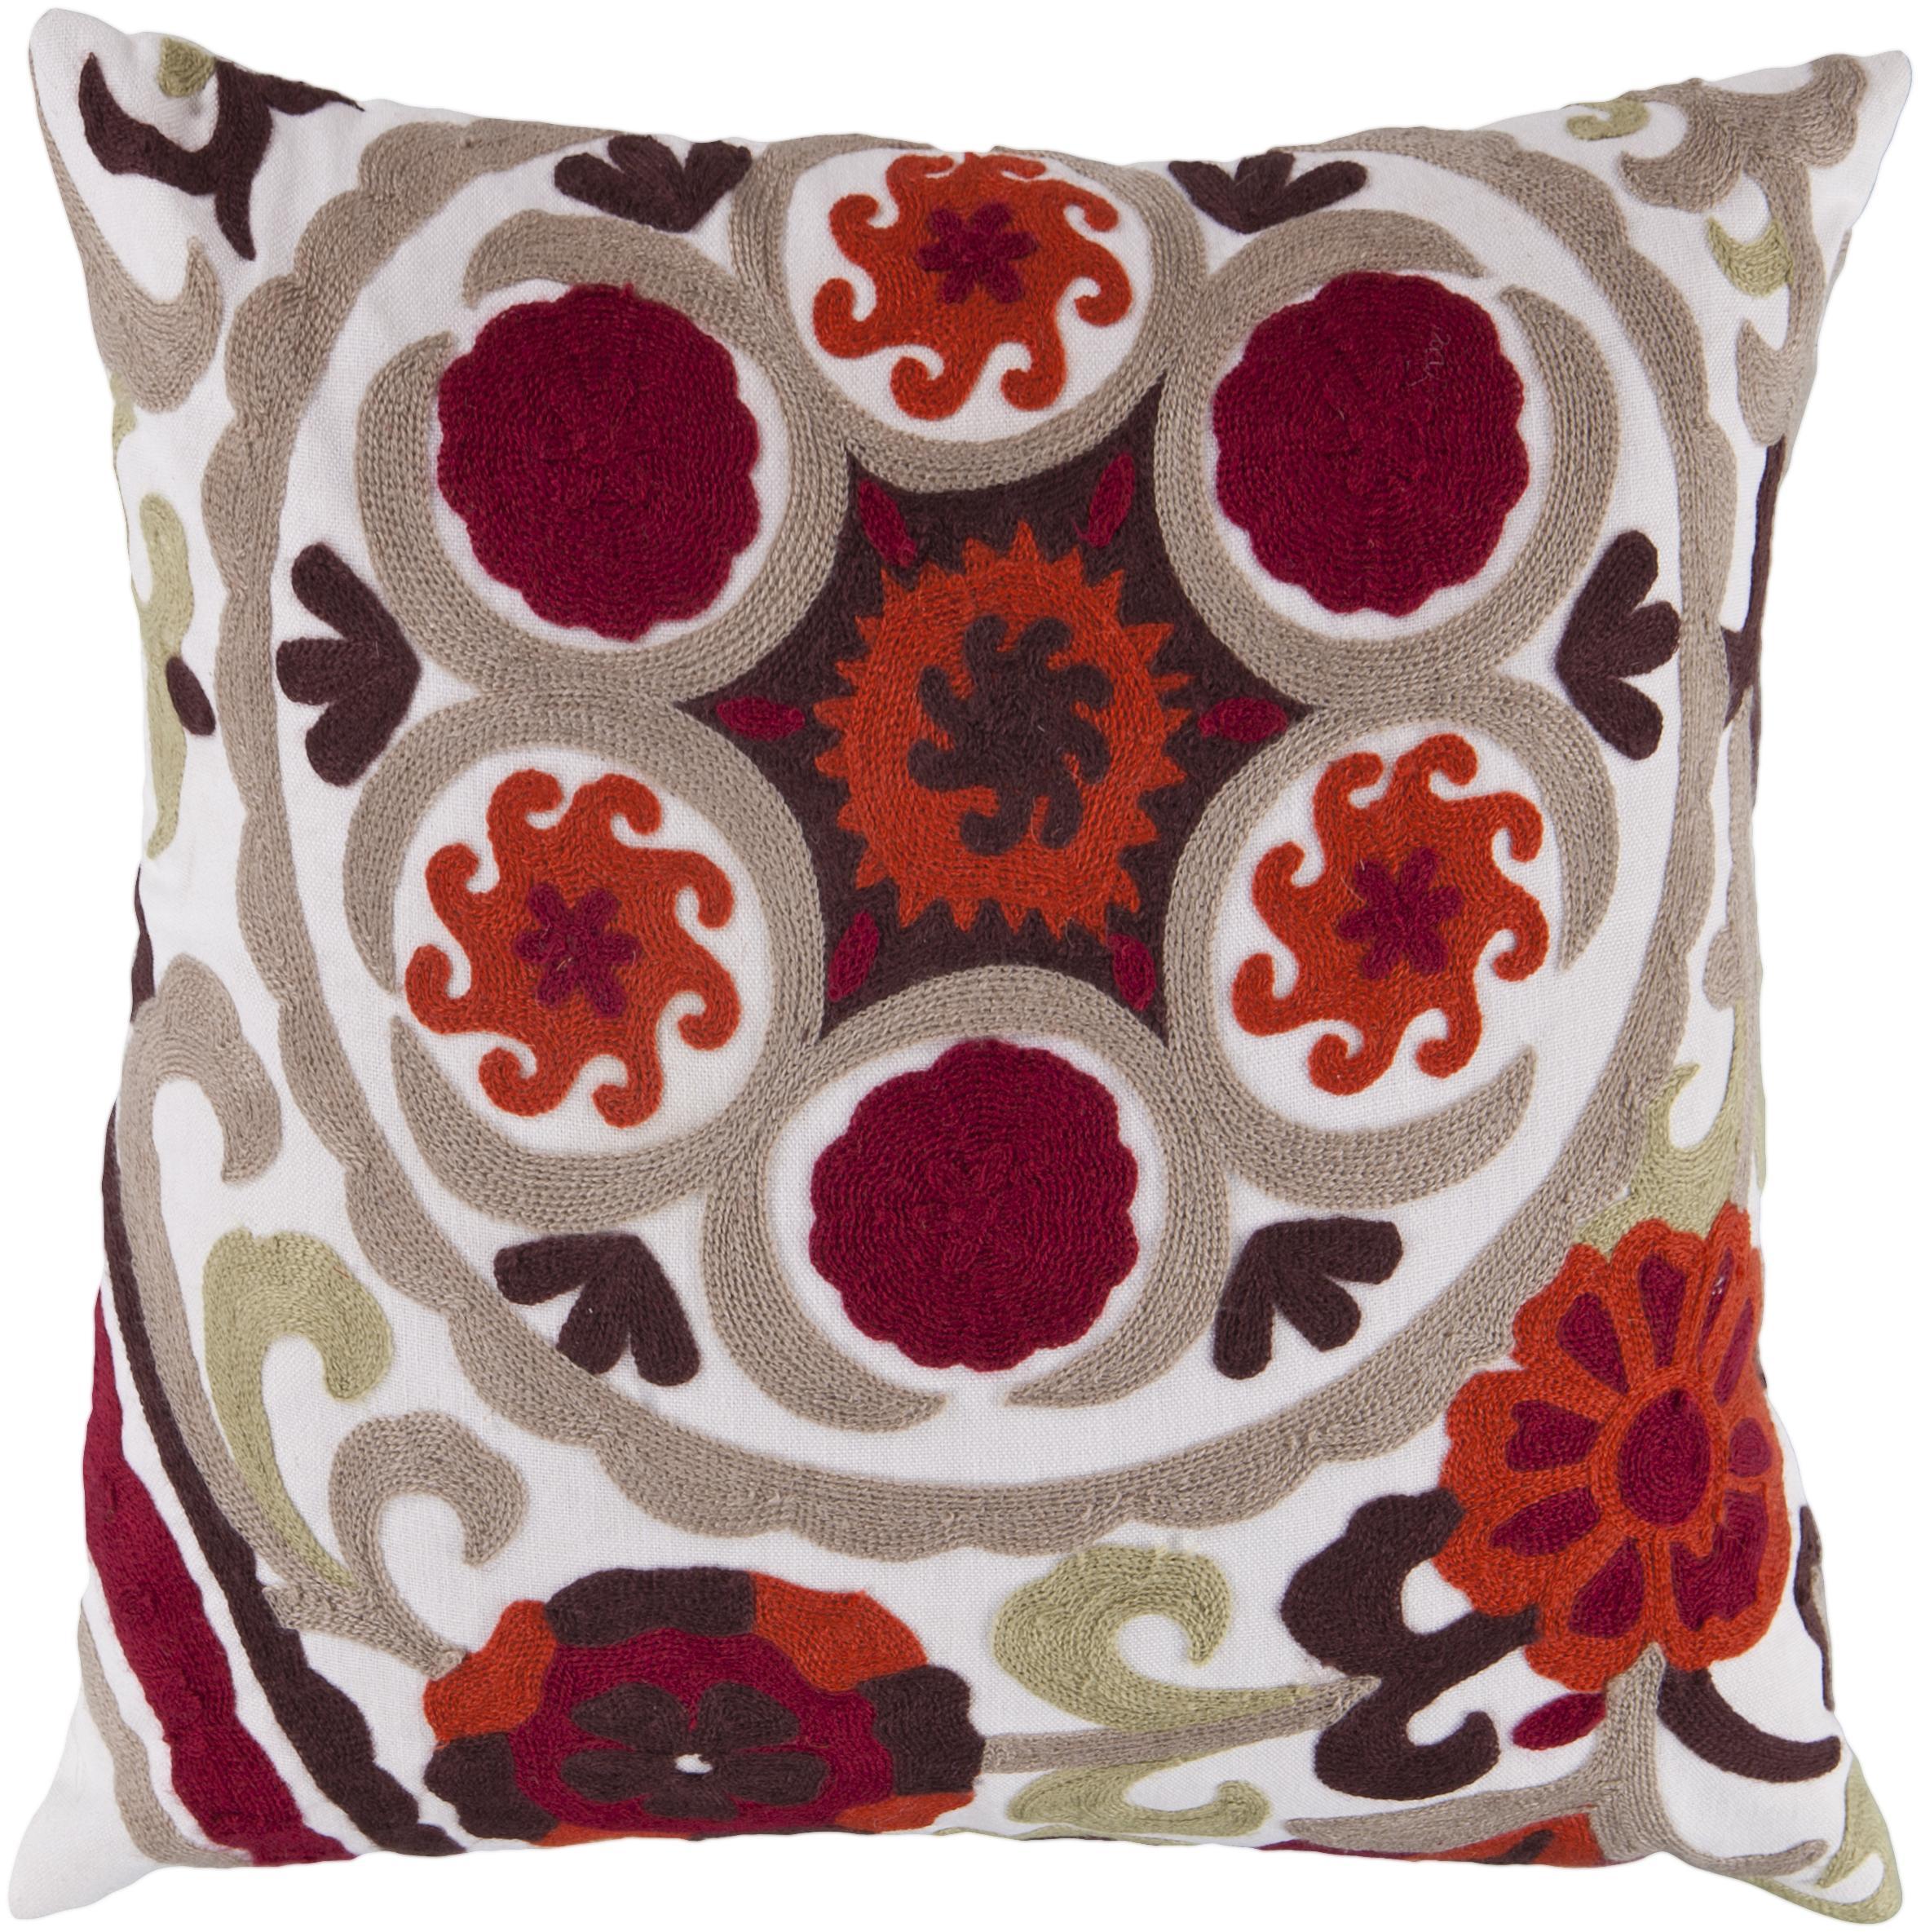 "Surya Rugs Pillows 18"" x 18"" Pillow - Item Number: FF028-1818P"